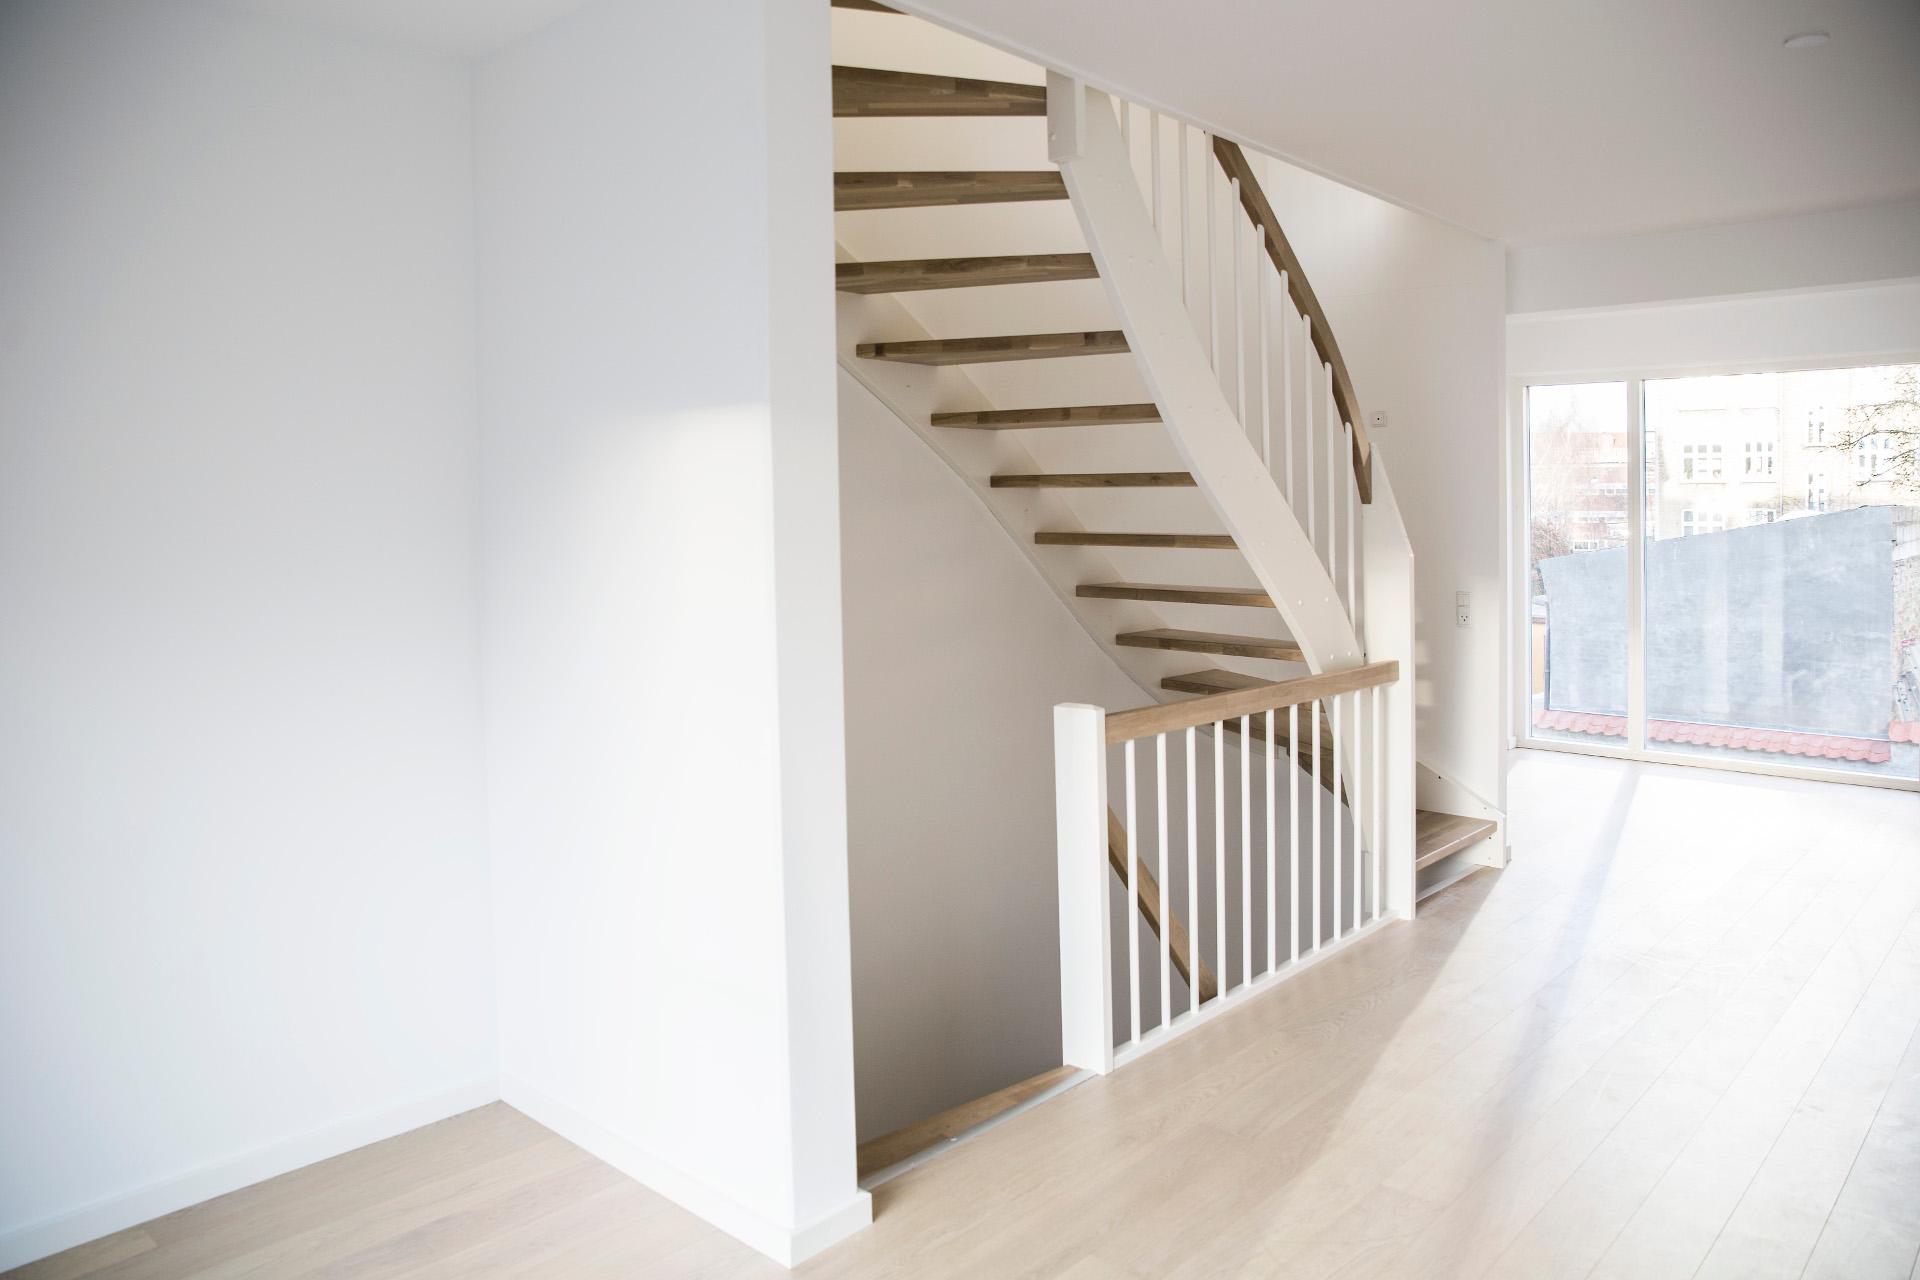 Taghusene trappe